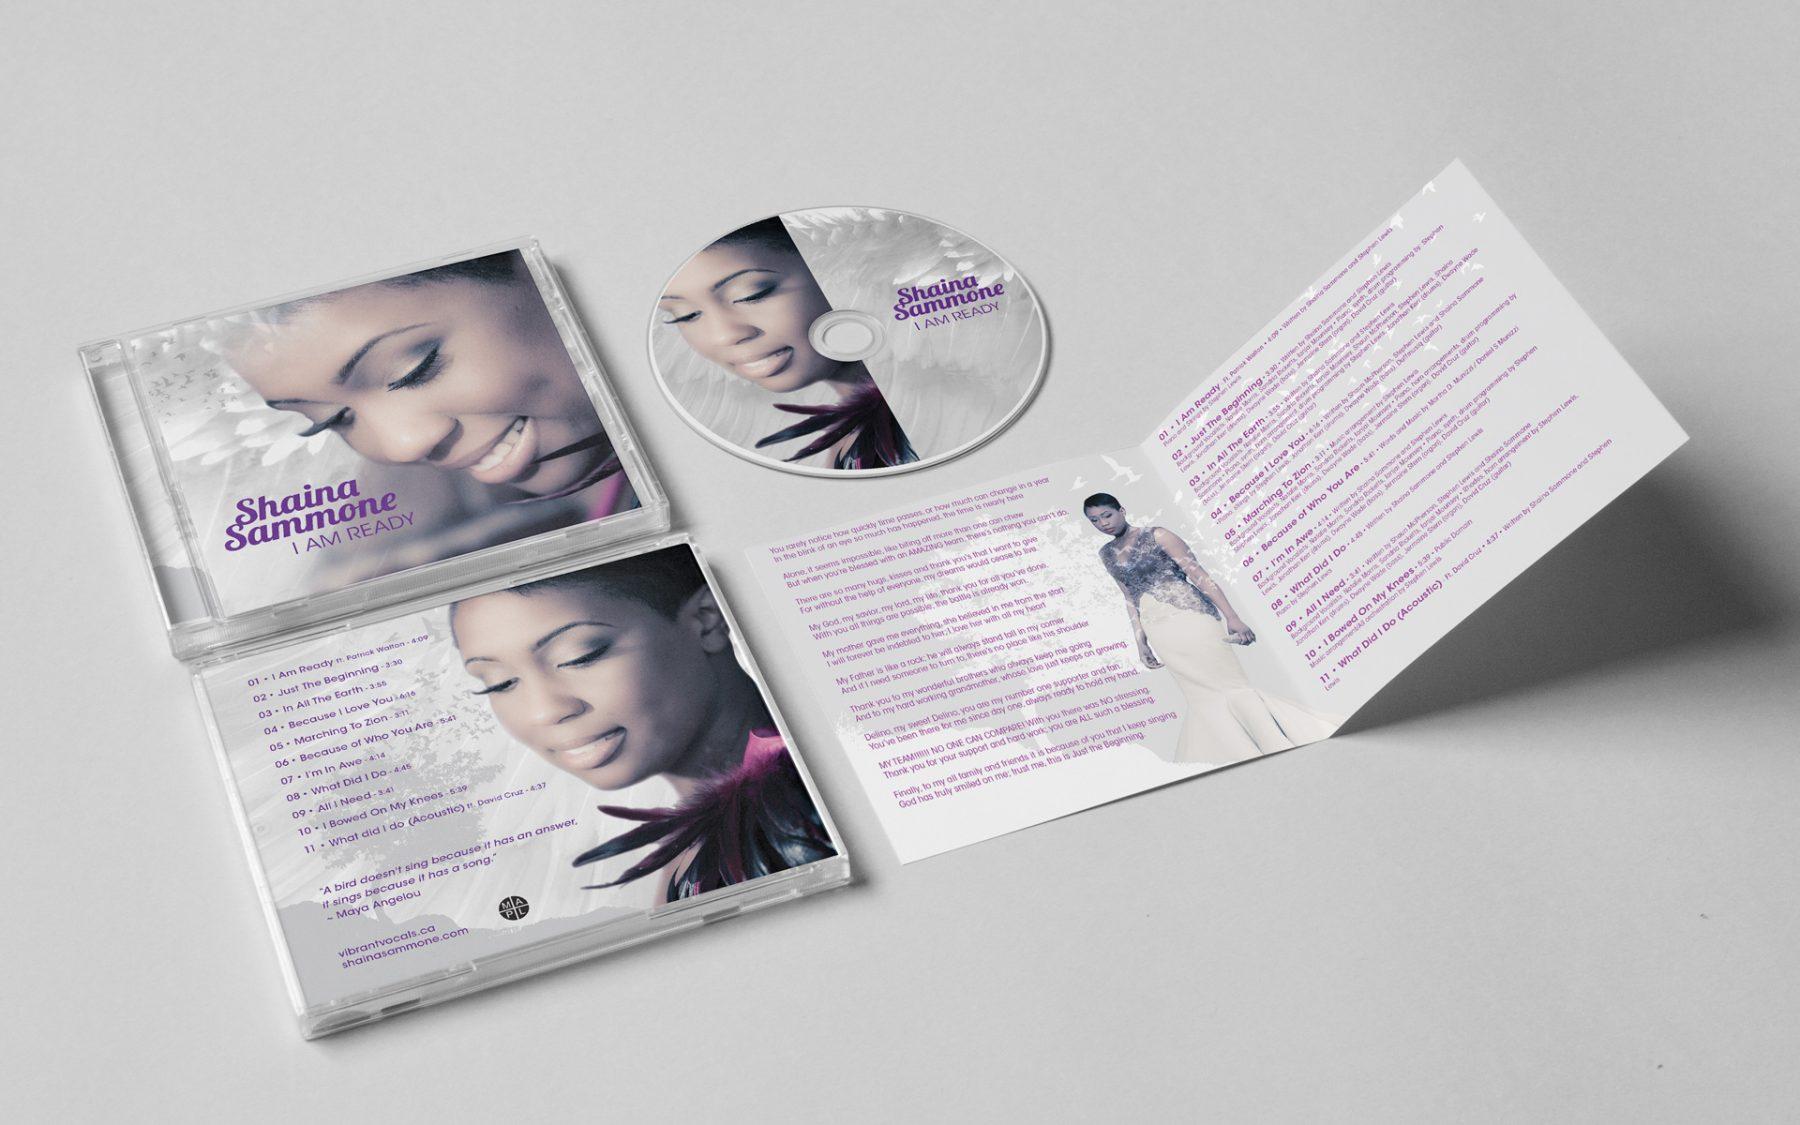 Shaina Sammone: CD Design